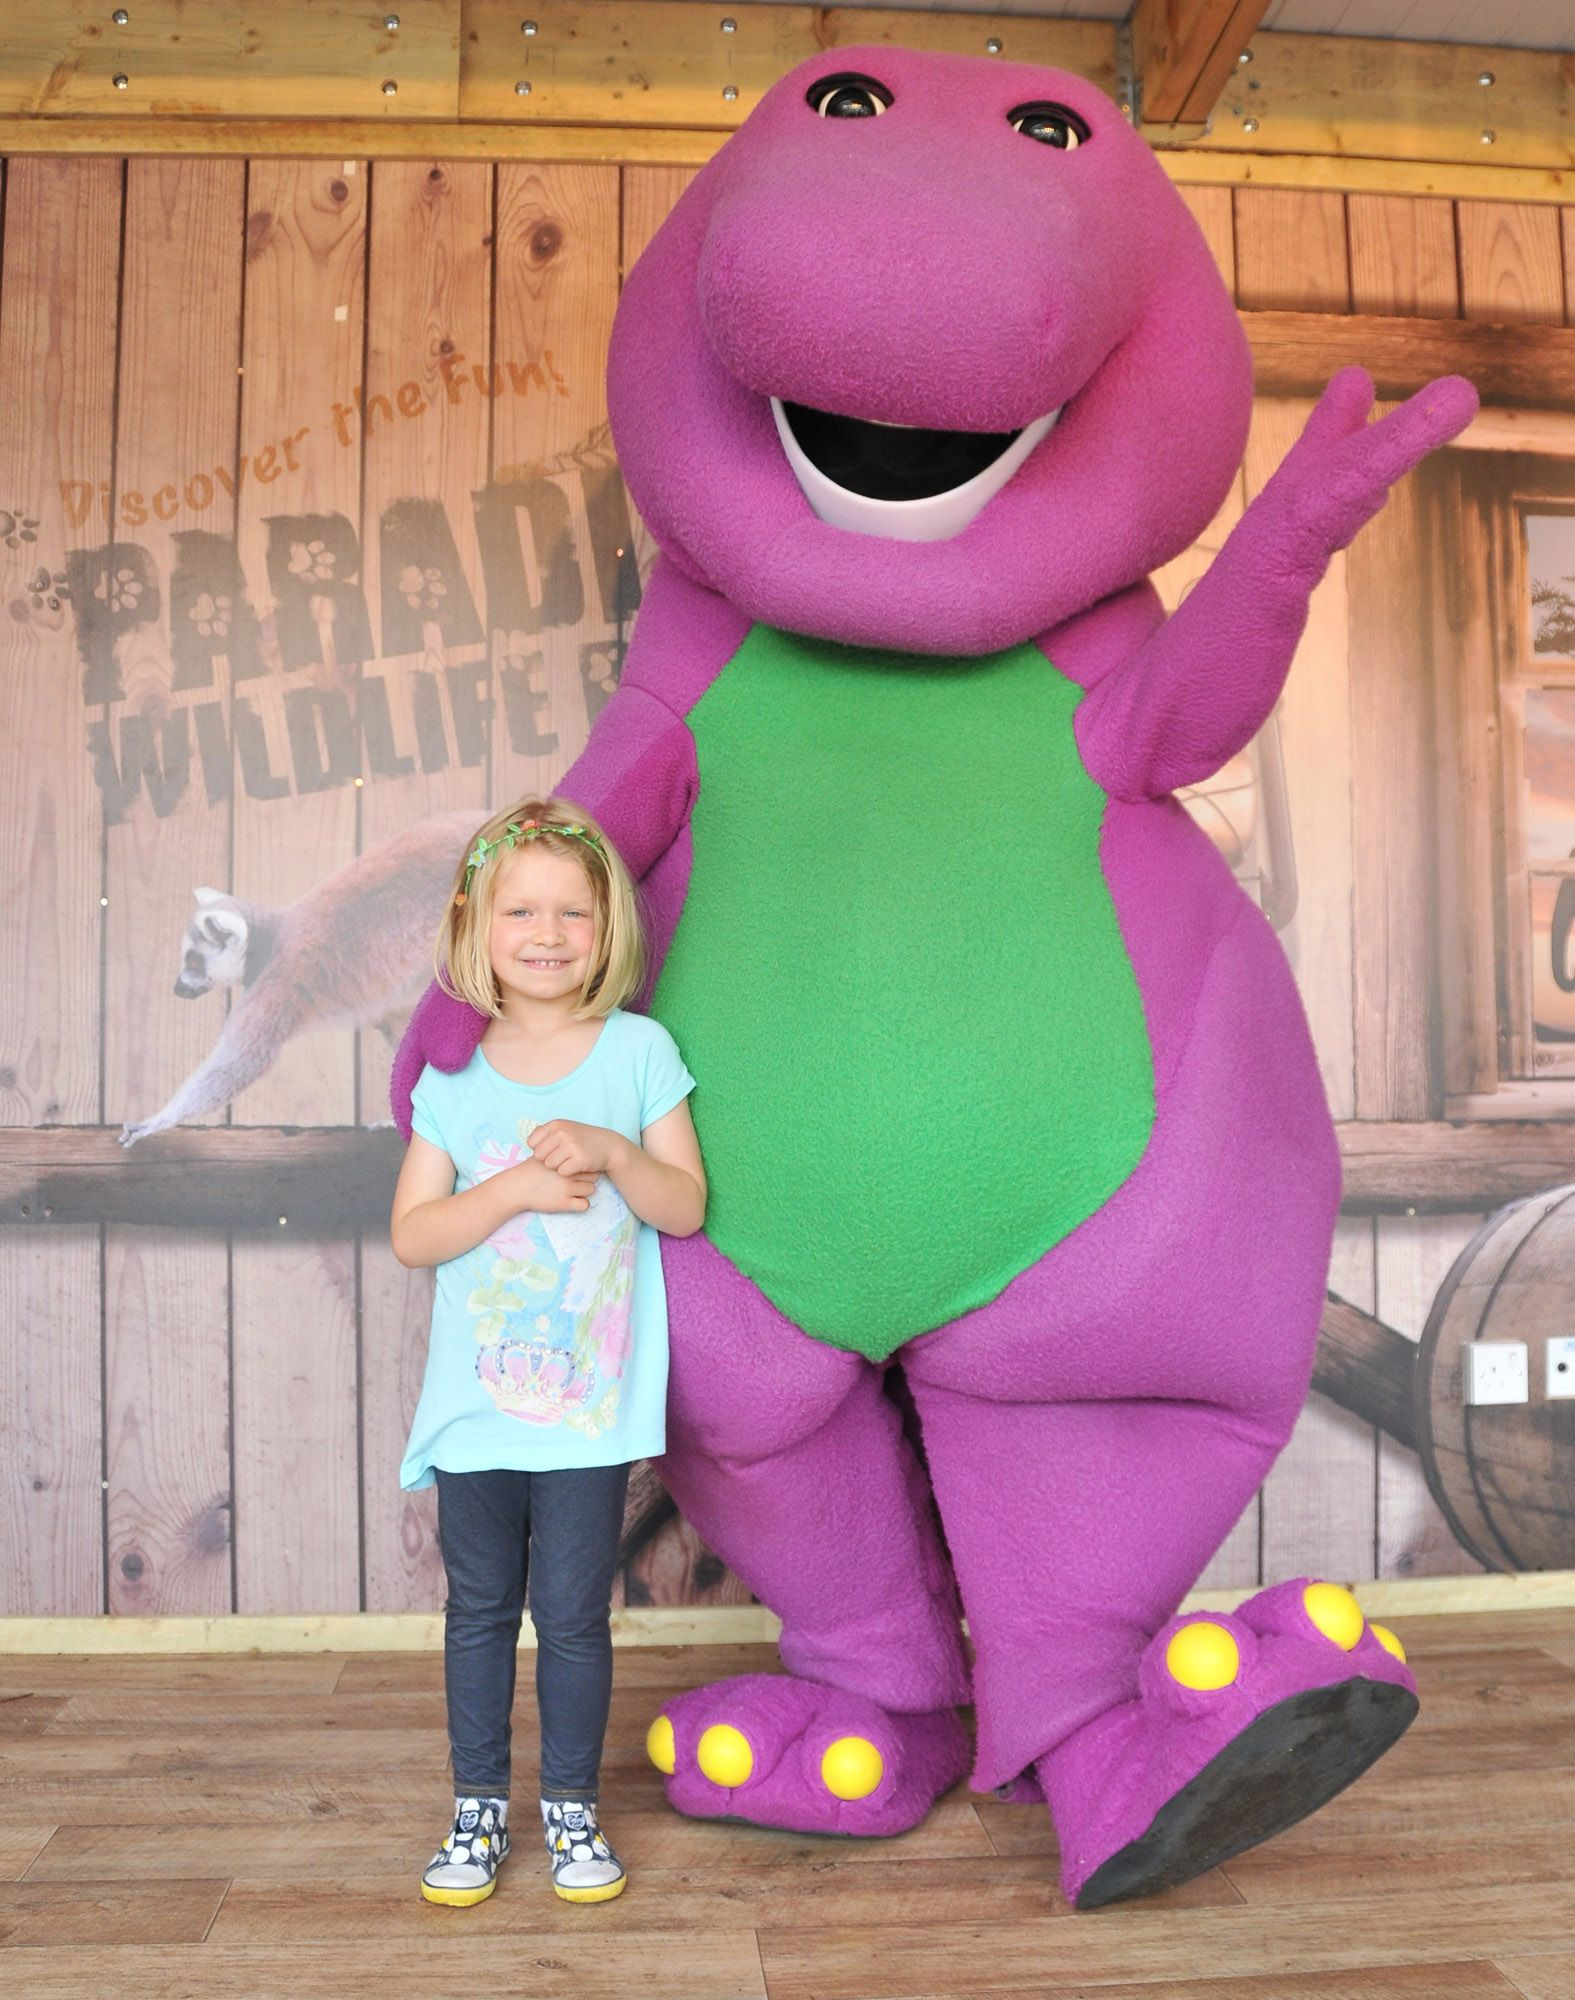 Barneythedinosaur Barney The Dinosaurs Barney Pbs Kids